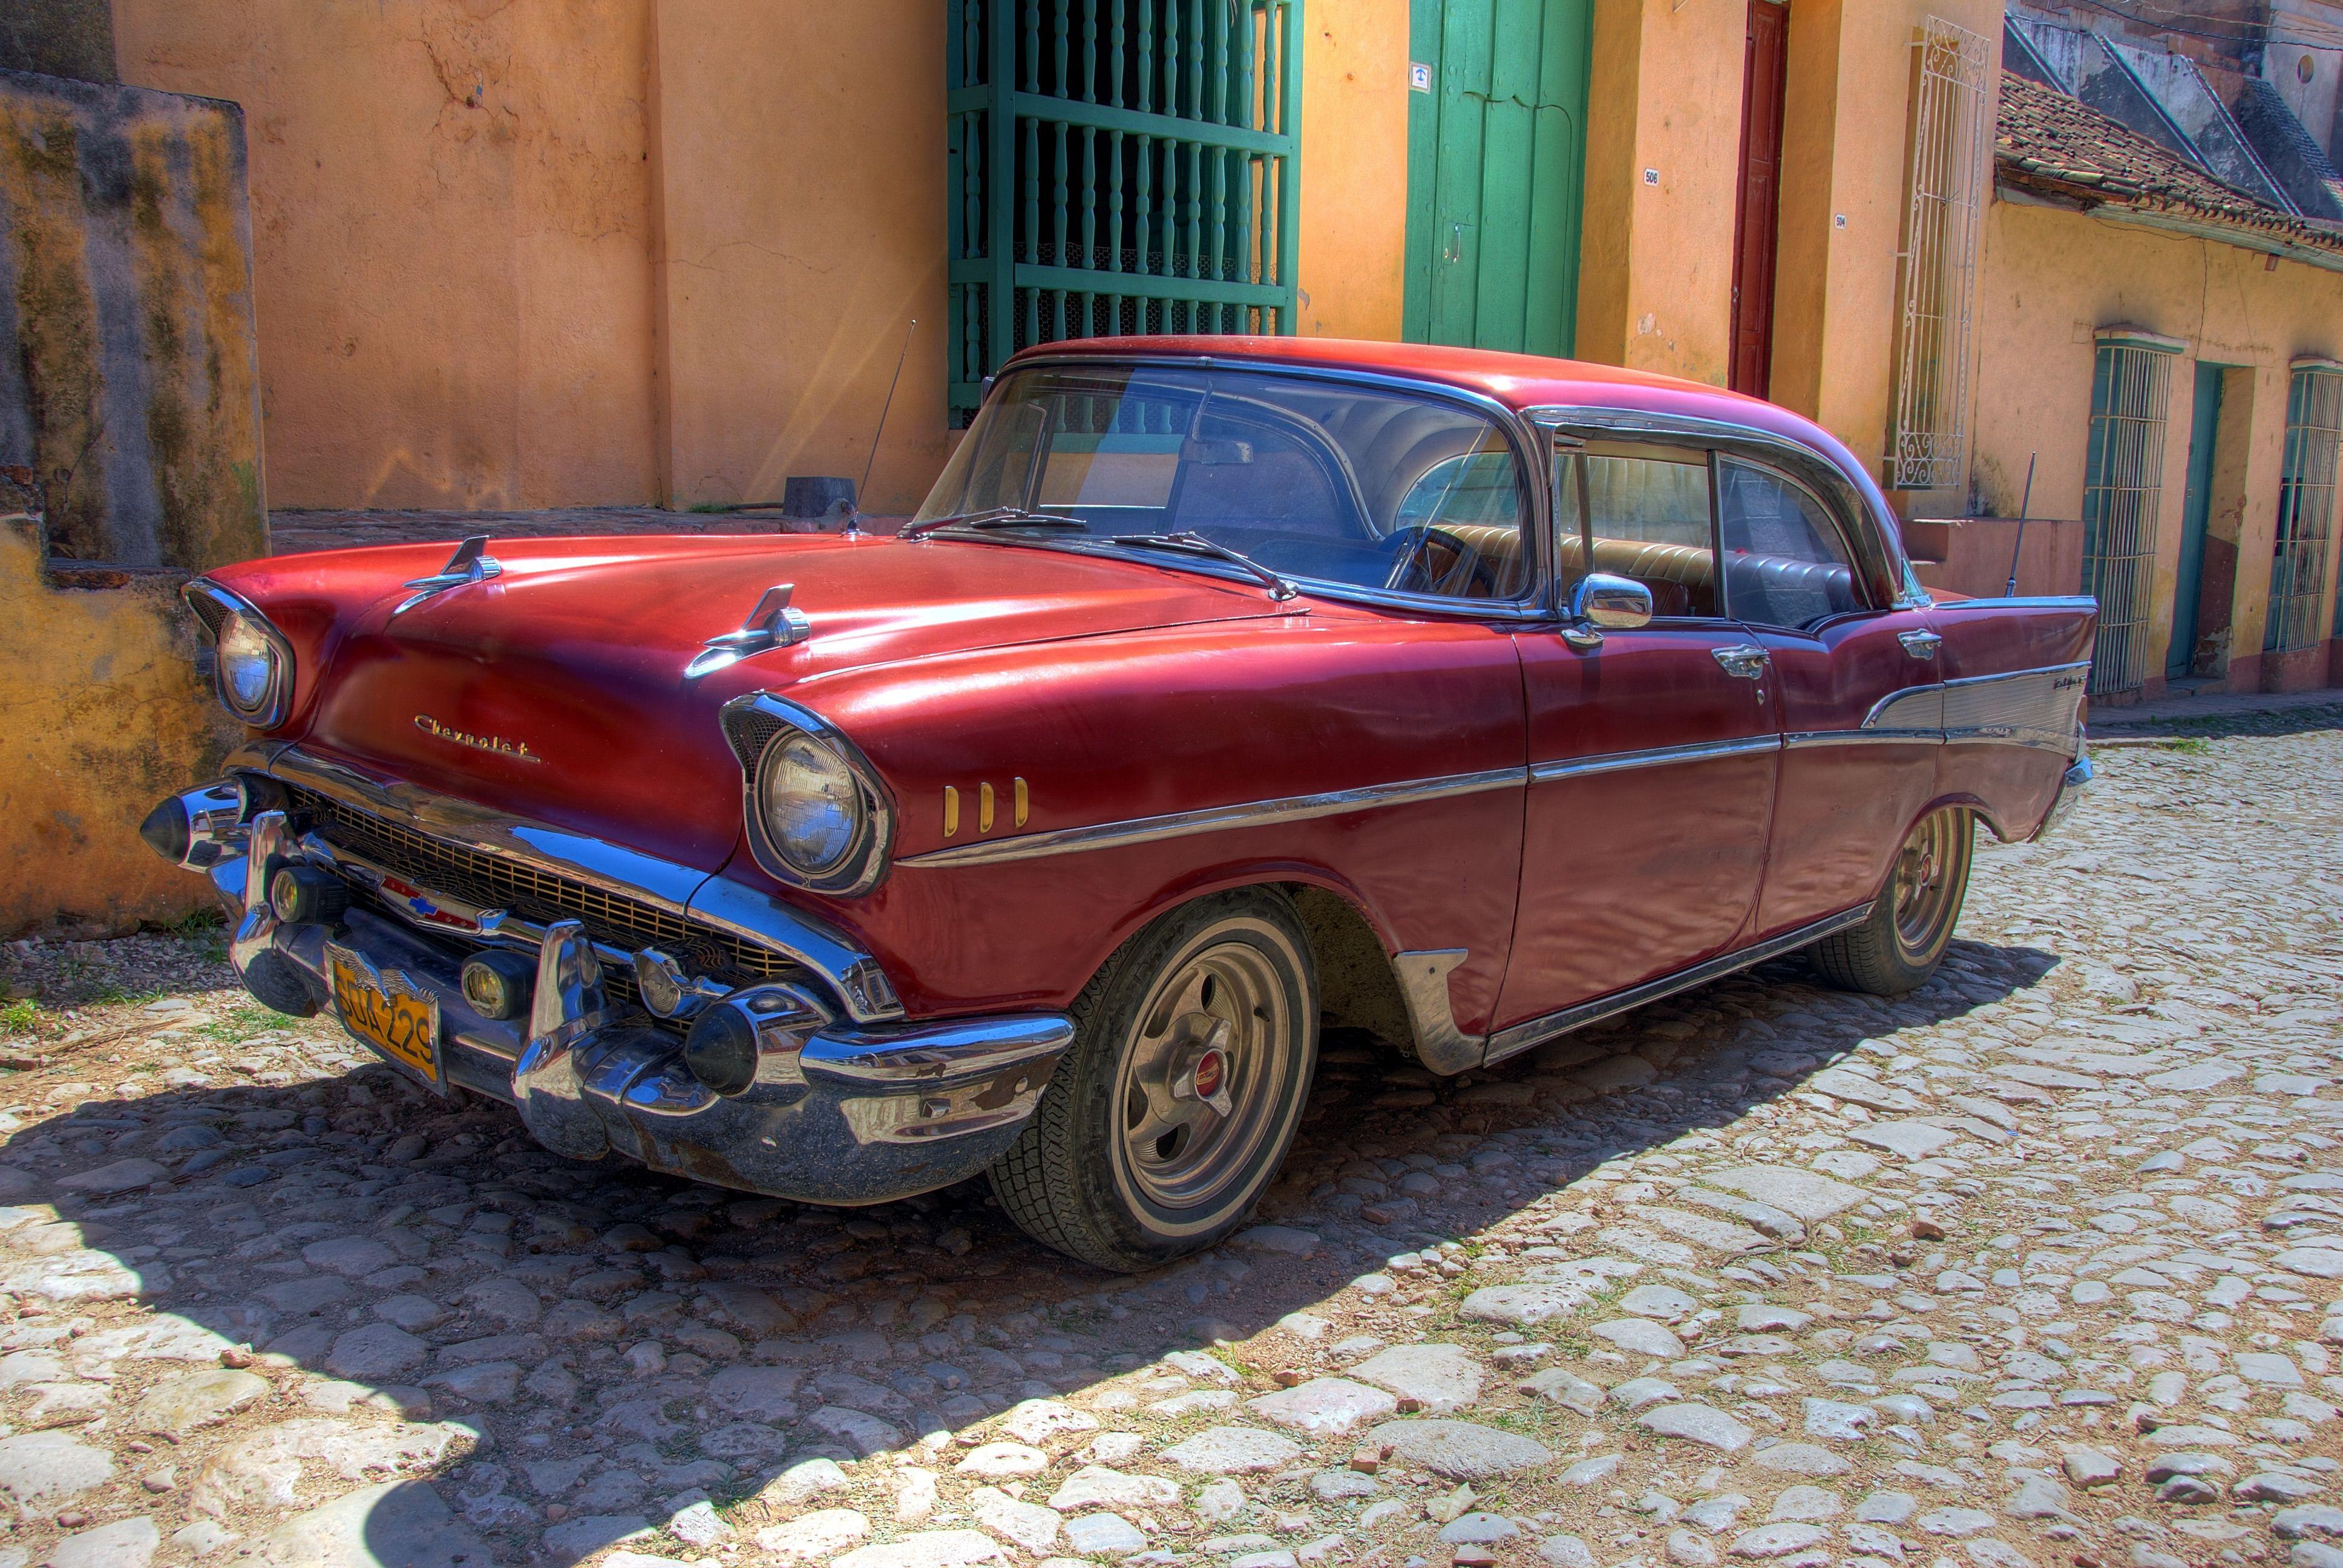 nice chevrolet old retro cars car cuba havana 531 | Cars | Pinterest ...